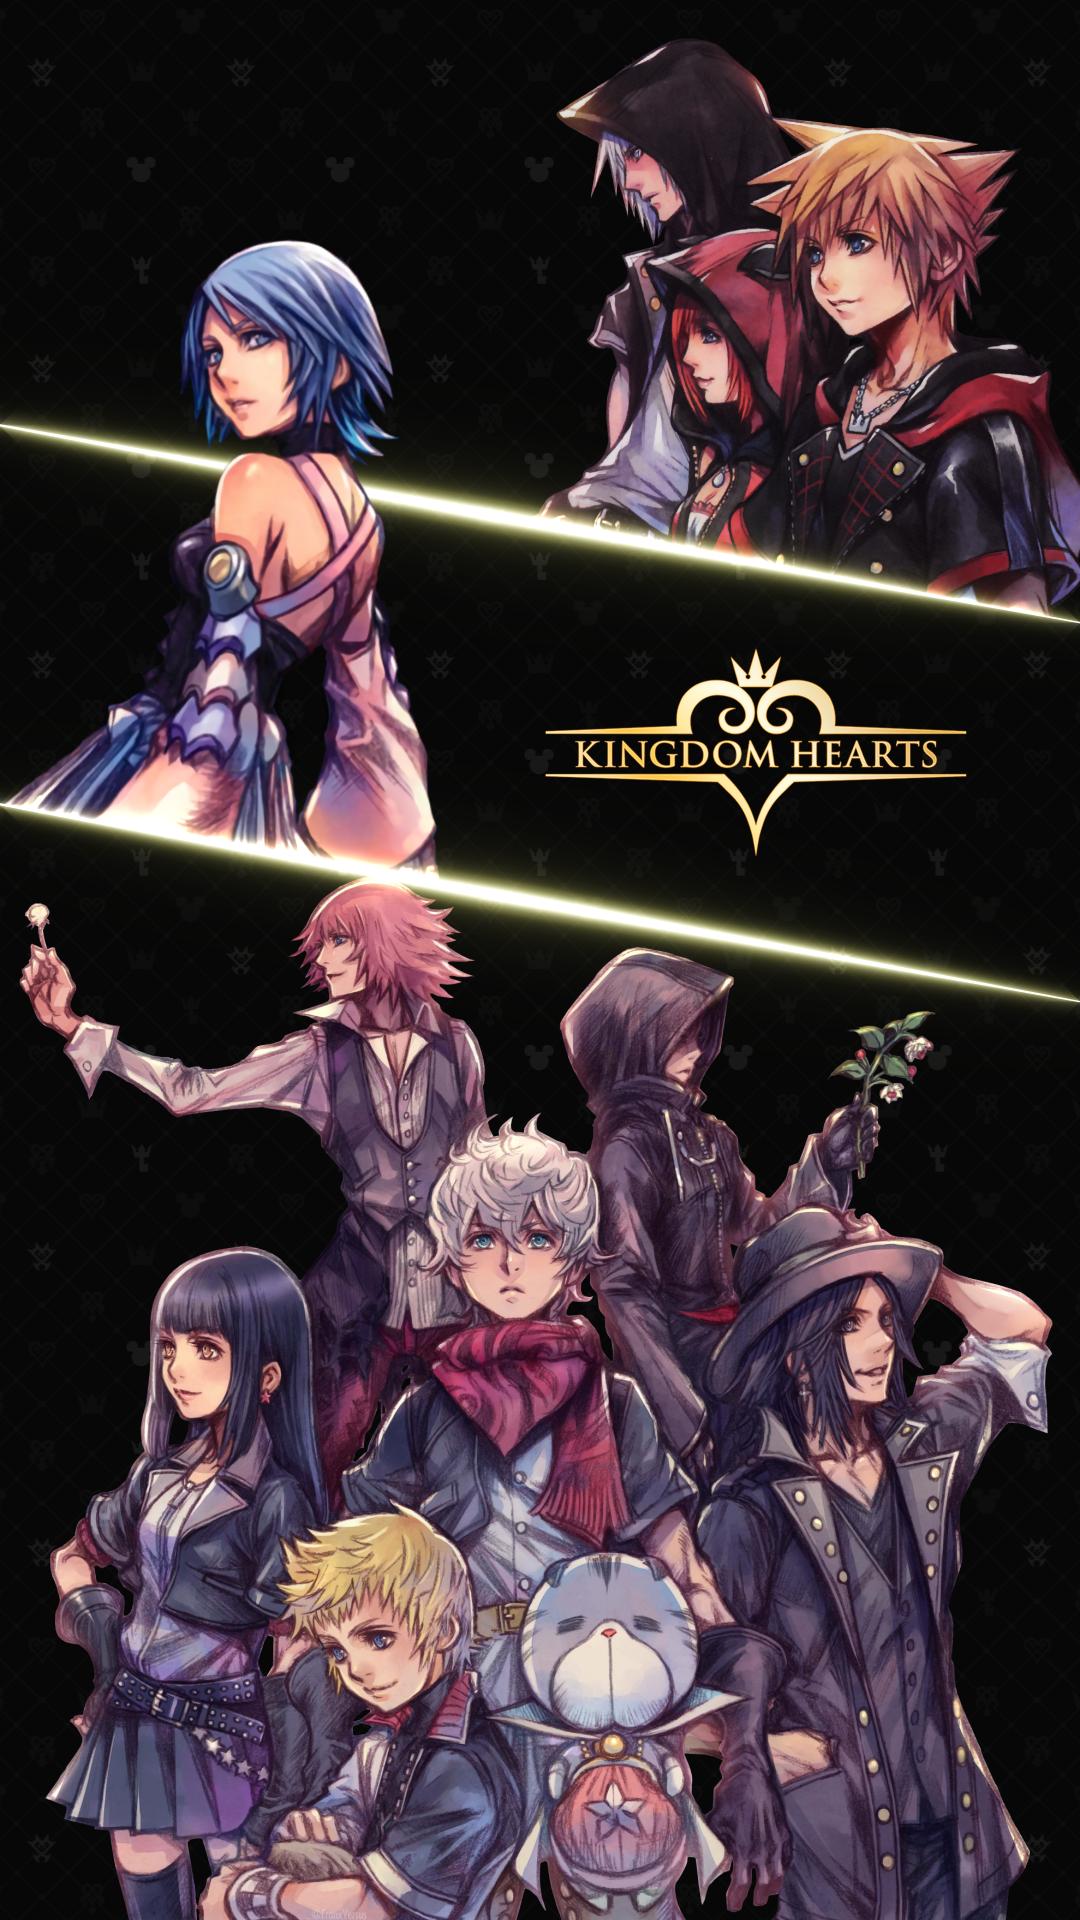 Kingdom Hearts Mobile Wallpaper Kingdom Hearts Wallpaper